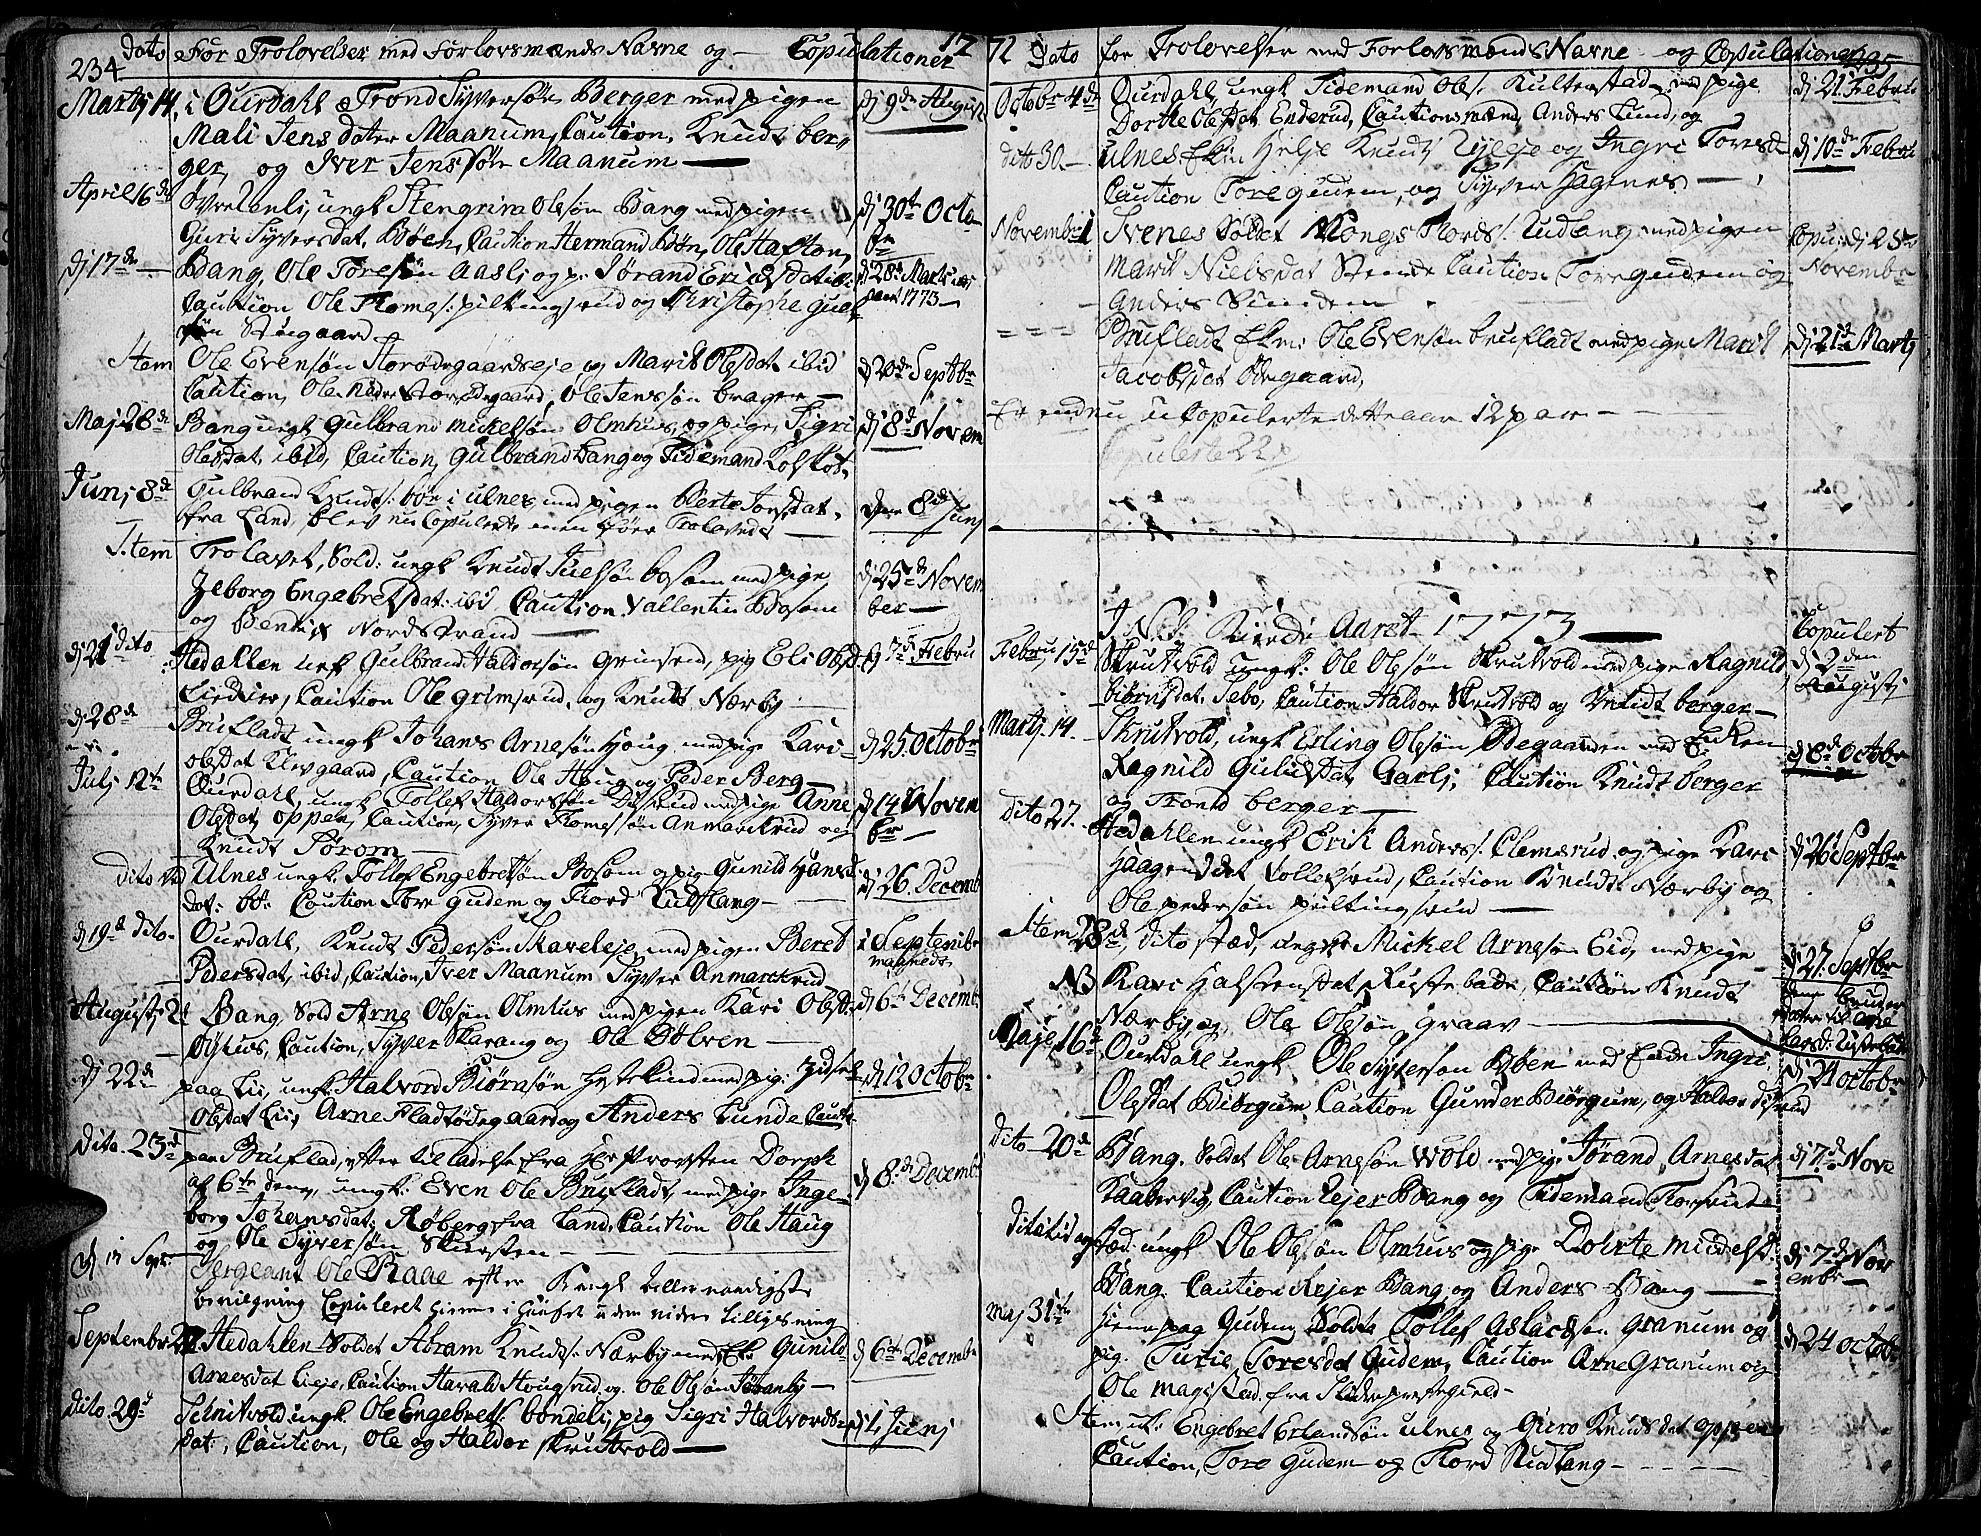 SAH, Aurdal prestekontor, Ministerialbok nr. 5, 1763-1781, s. 234-235